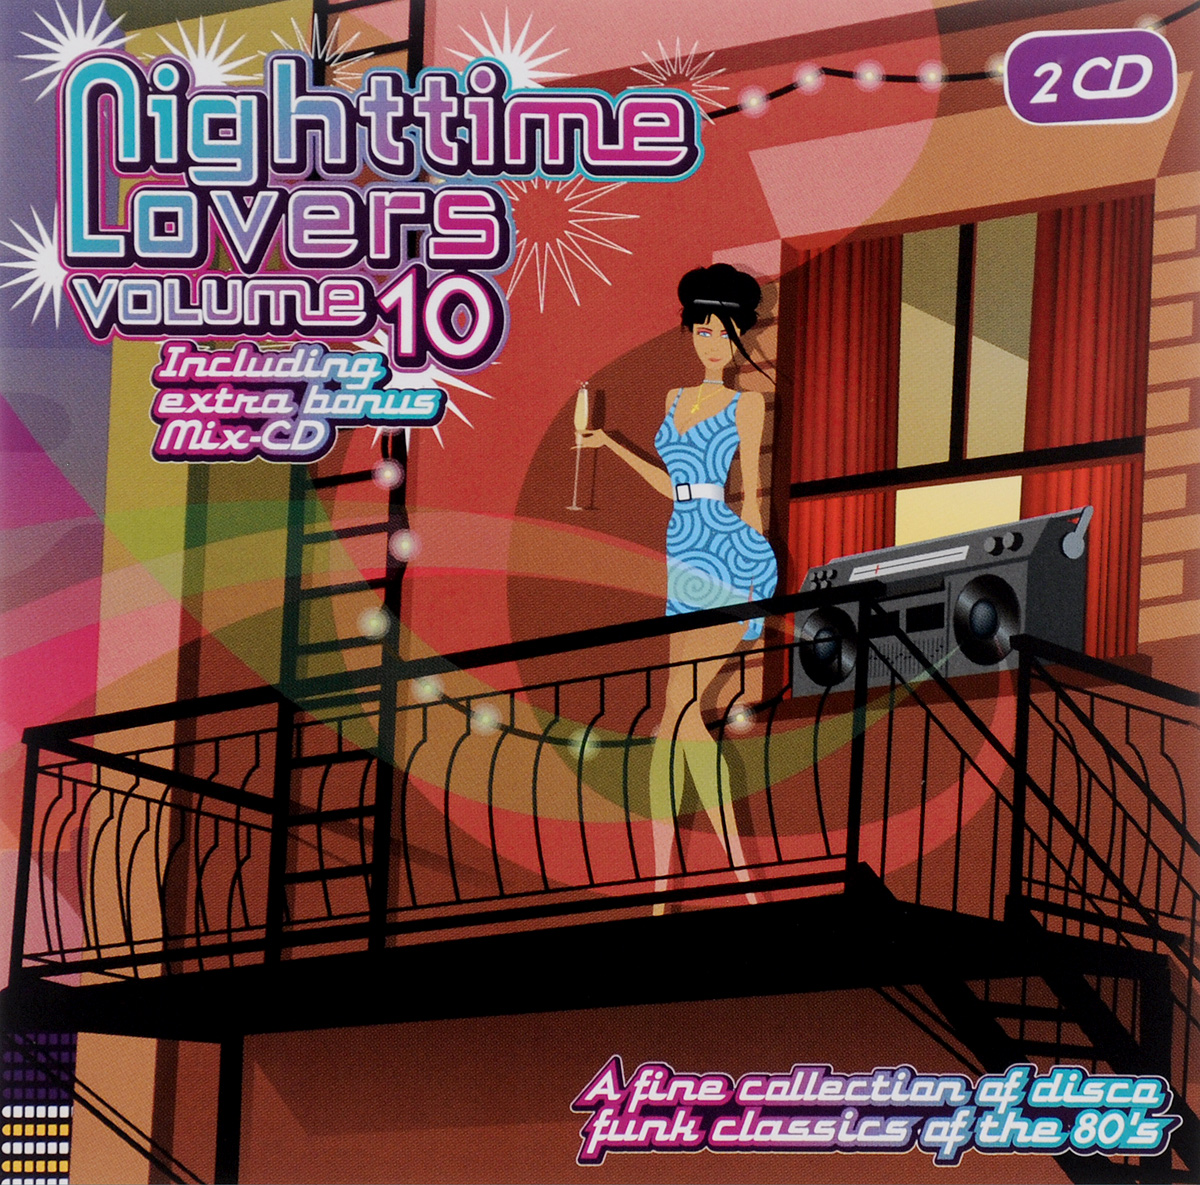 The Jones Girls,Кейт Свит,Jazzy Dee,One On One Nighttime Lovers. Volume 10 (2 CD)